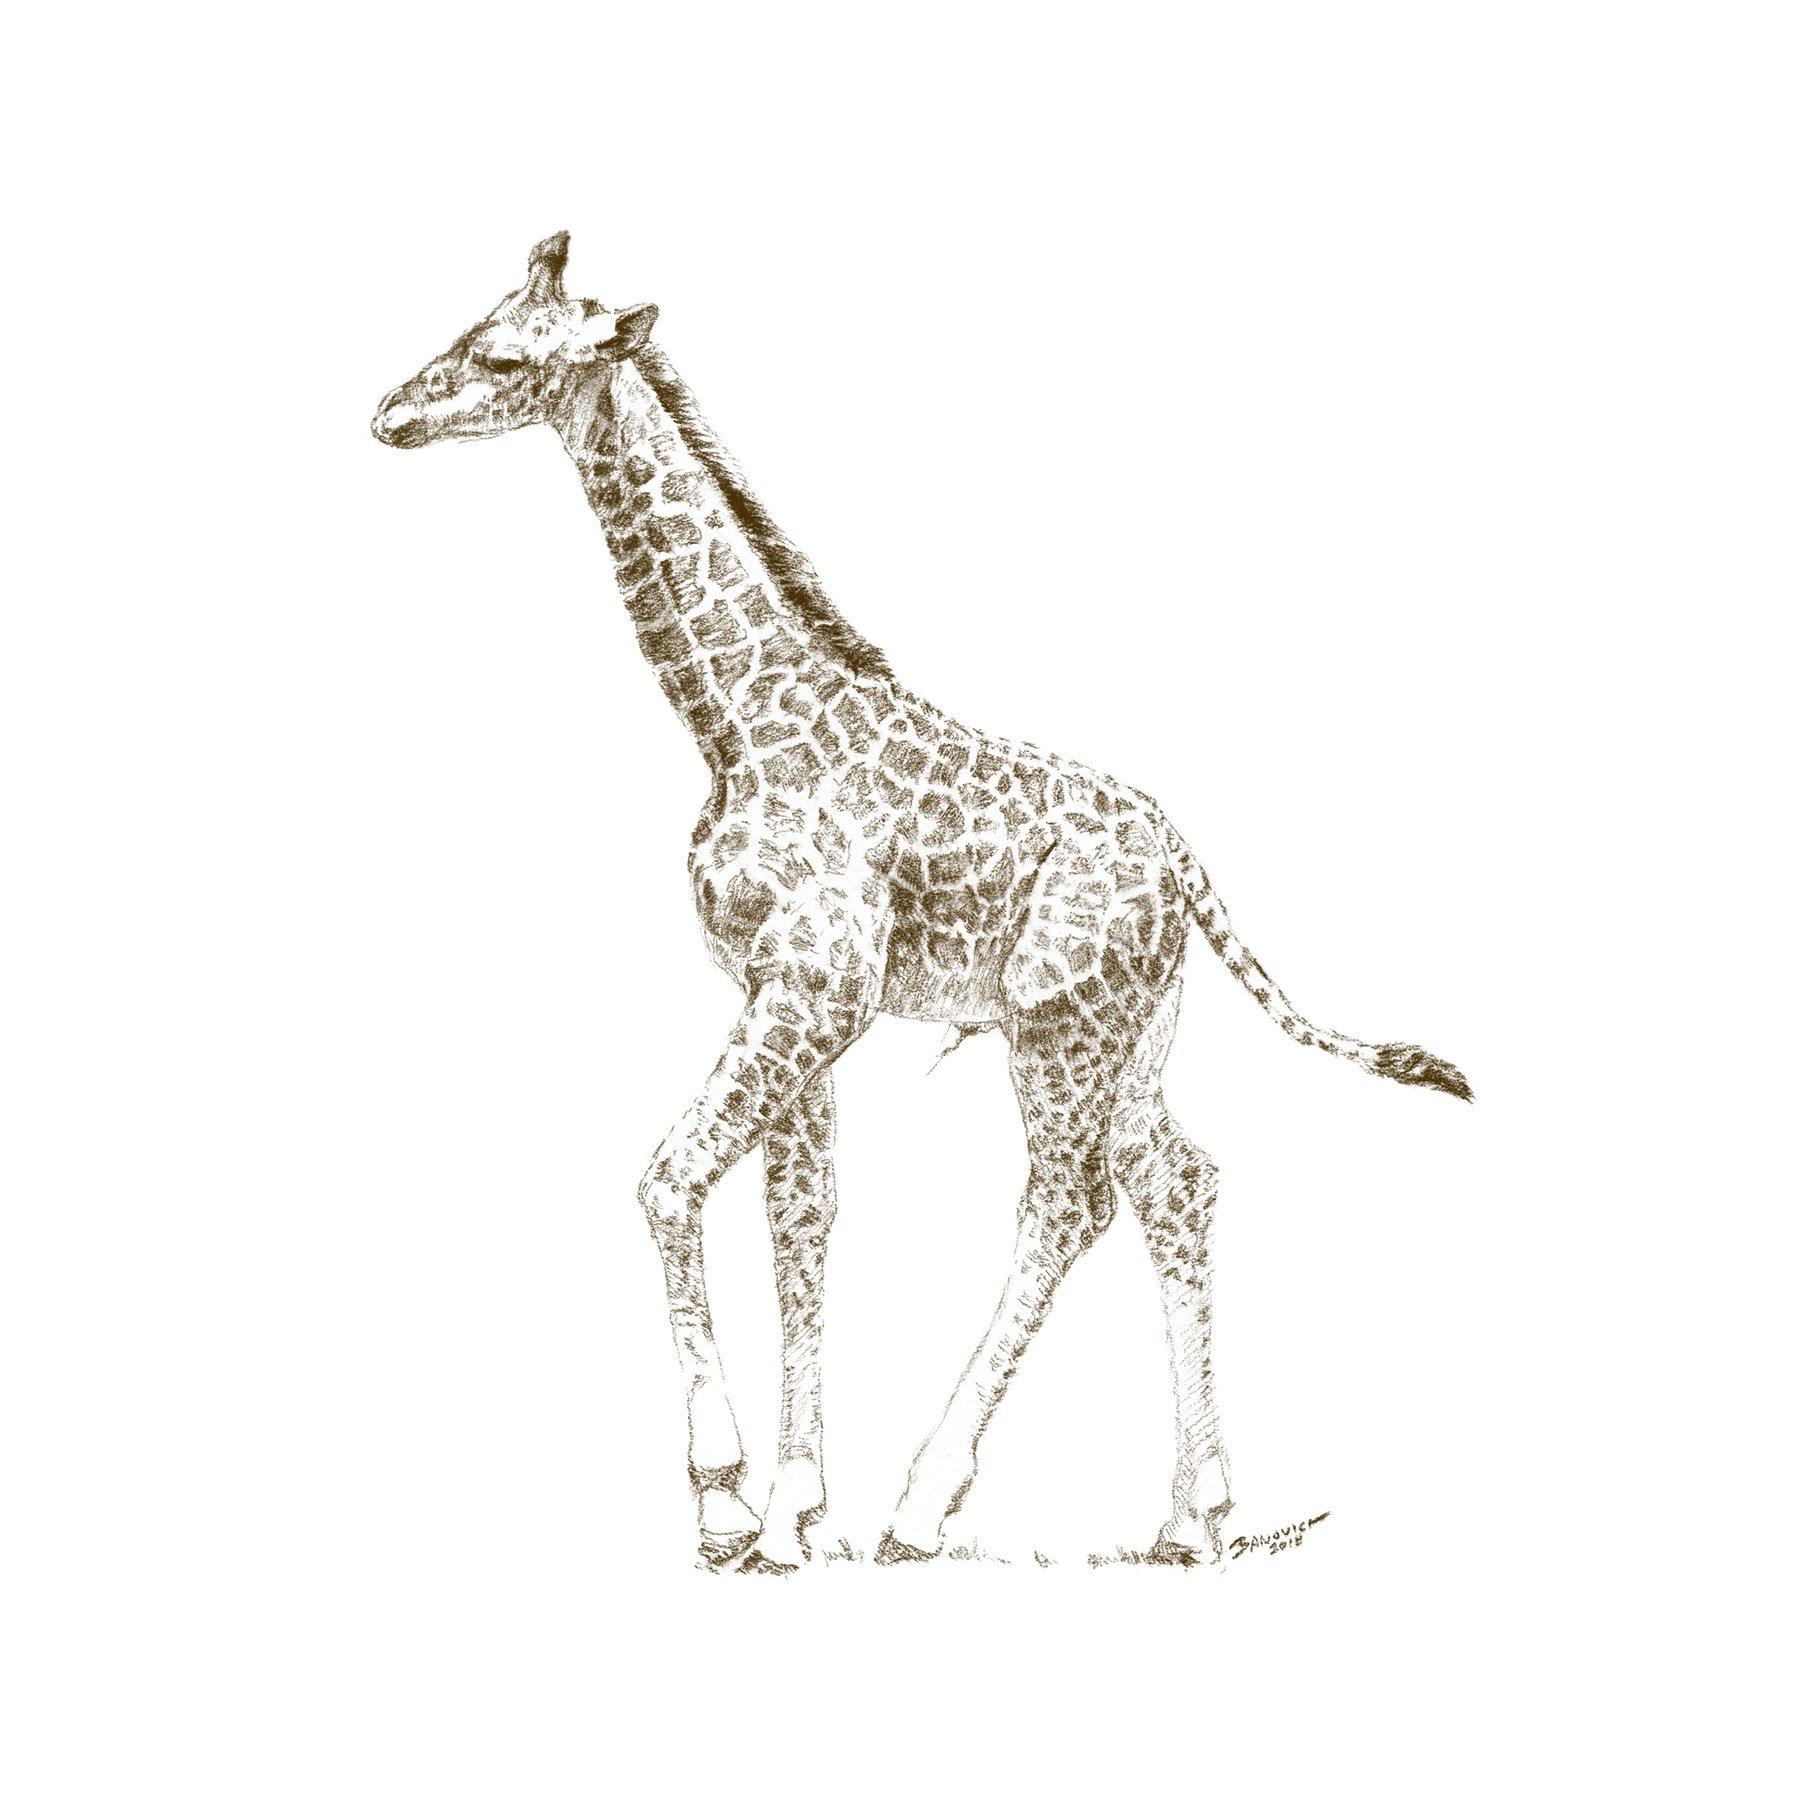 Wild Child - Giraffe - John Banovich